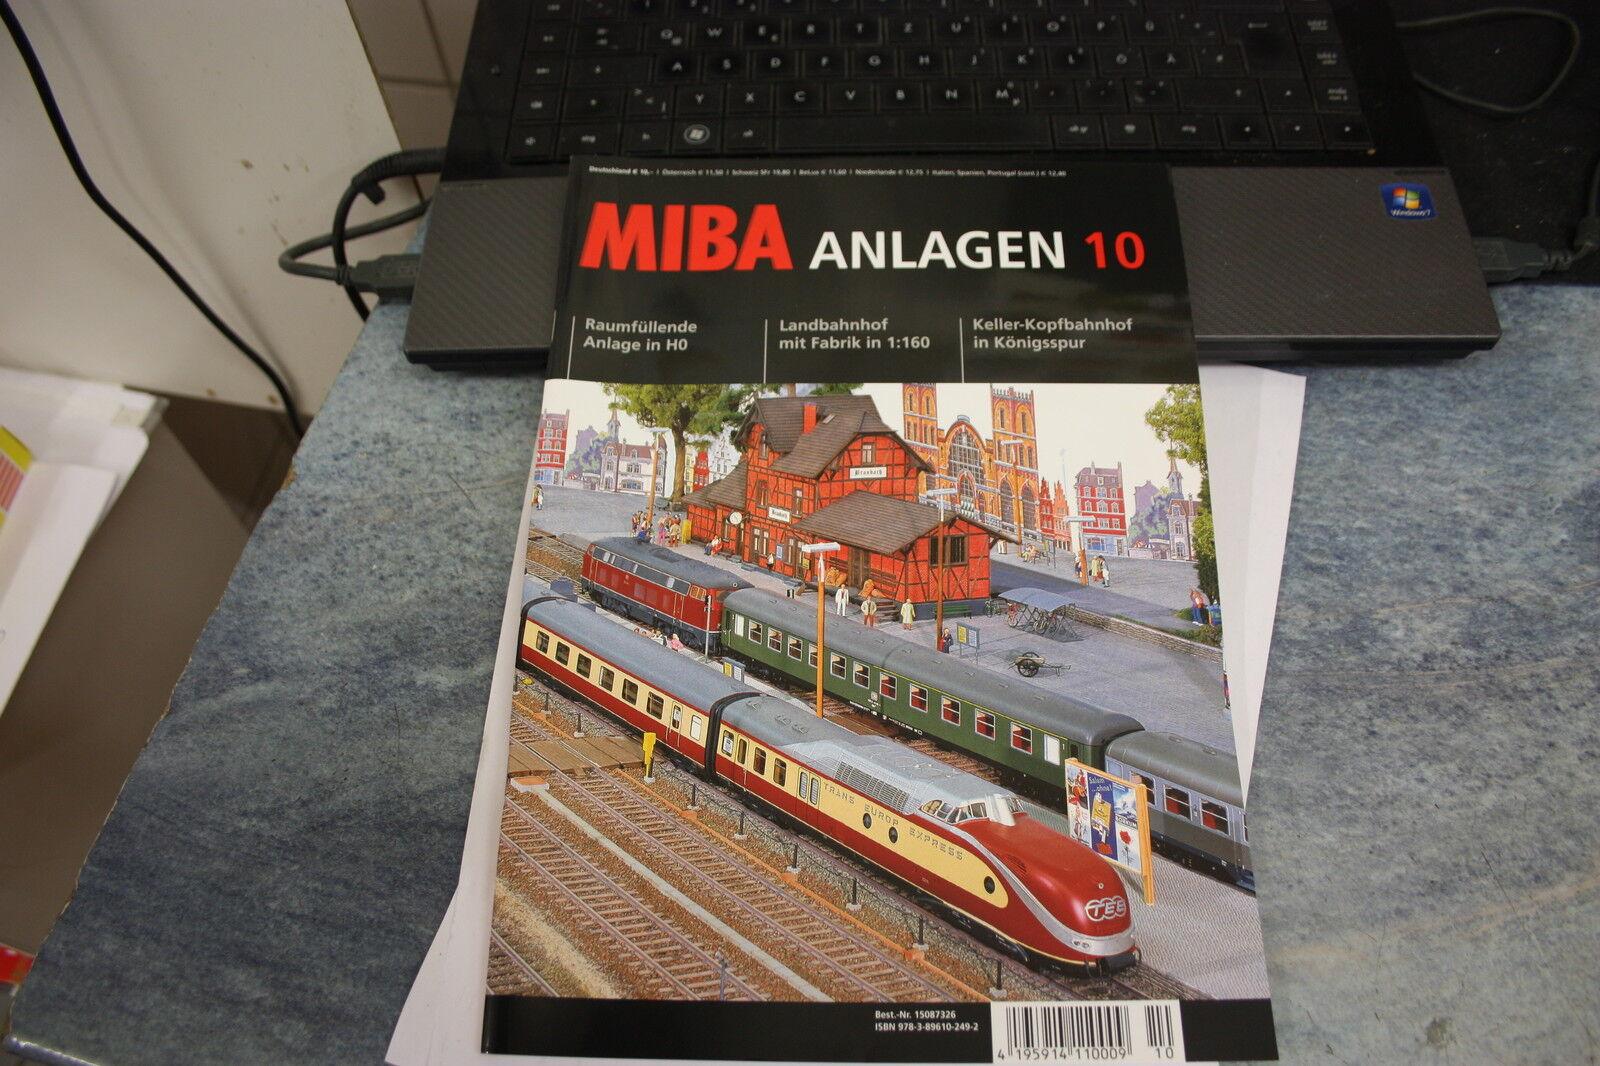 MIBA Anlagen 10